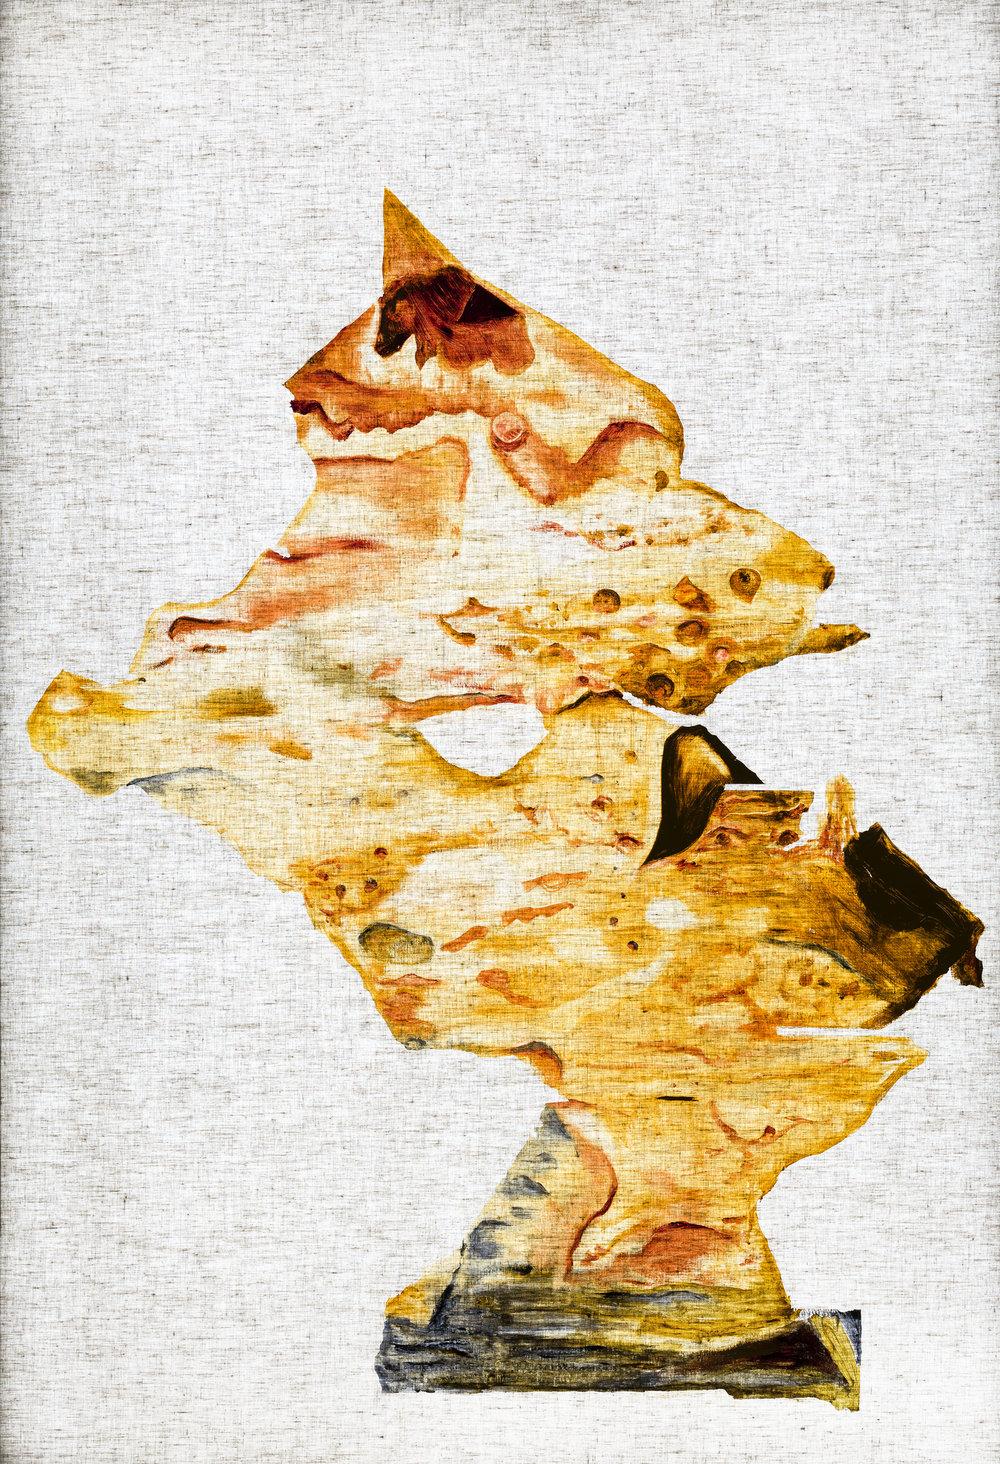 Ulf Rollof   Rorschach-Rollof 1  2019 157 x 107 x 10 cm Oil on linen cloth. LED light box, mixed media.